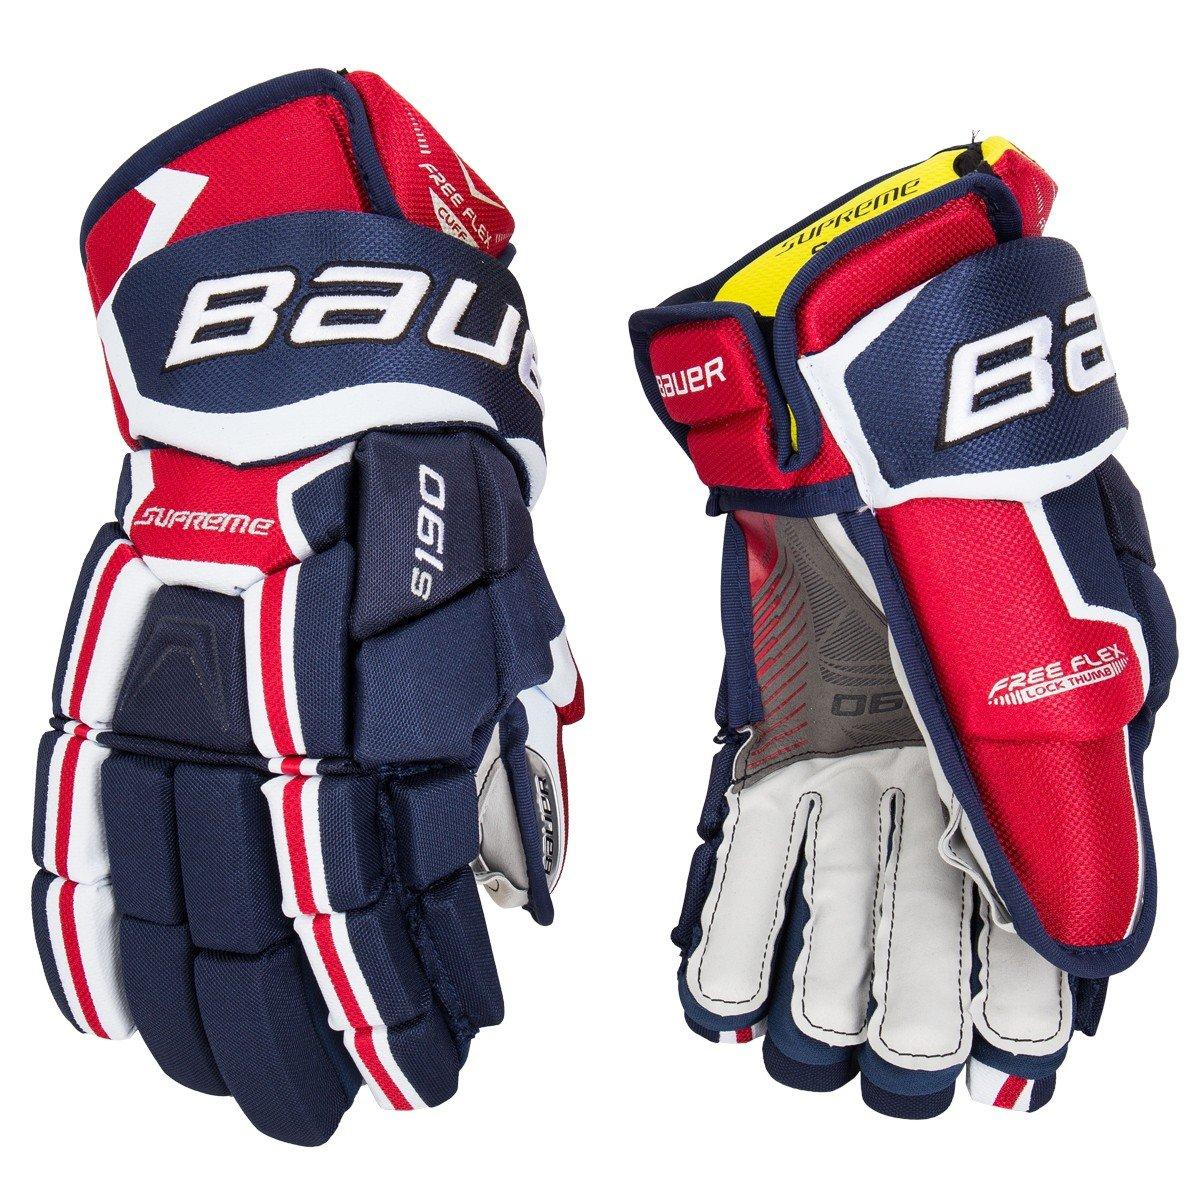 Generic Bauer Supreme S190Gants de Hockey Junior–Bleu Marine/Rouge/Blanc–30,5cm 5cm Unknown